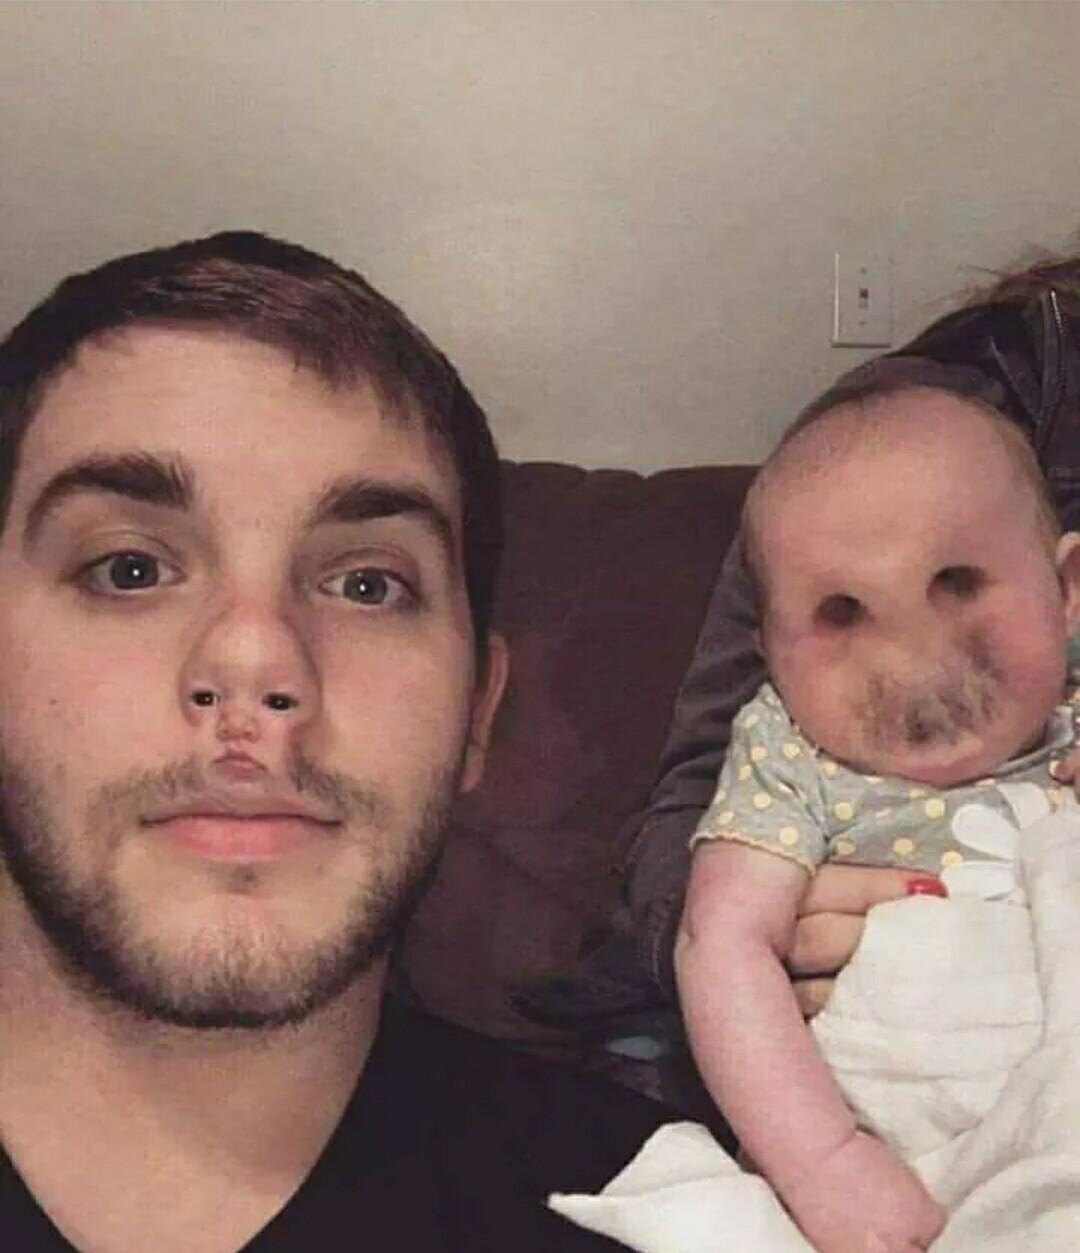 Snaps - meme